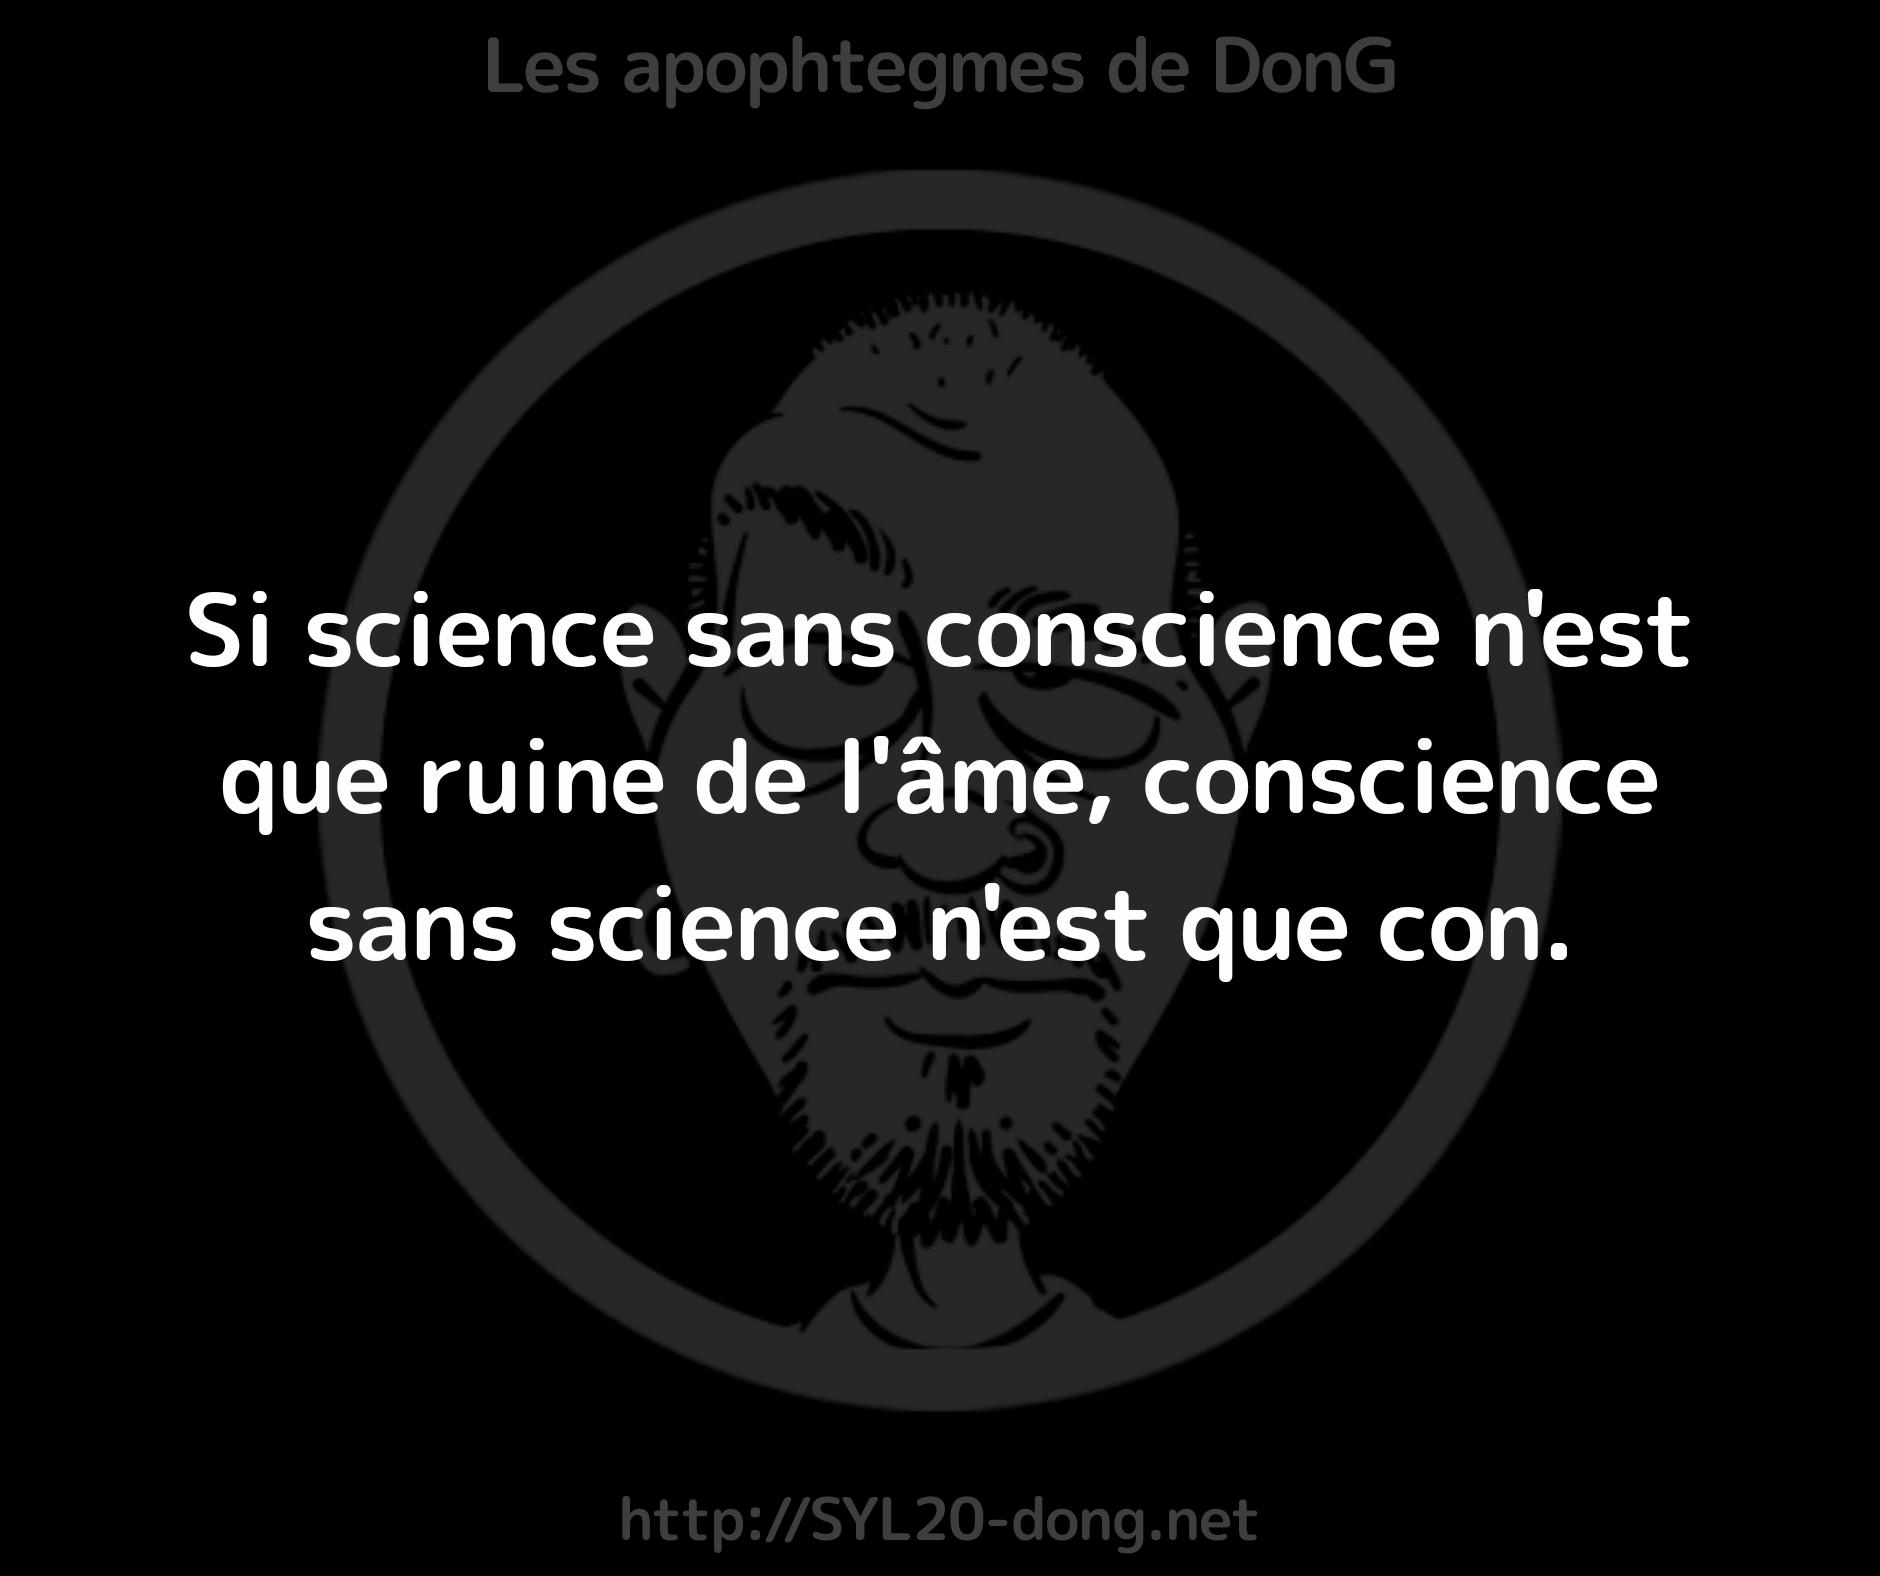 Si science sans conscience n'est que ruine de l'âme, conscience sans science n'est que con.